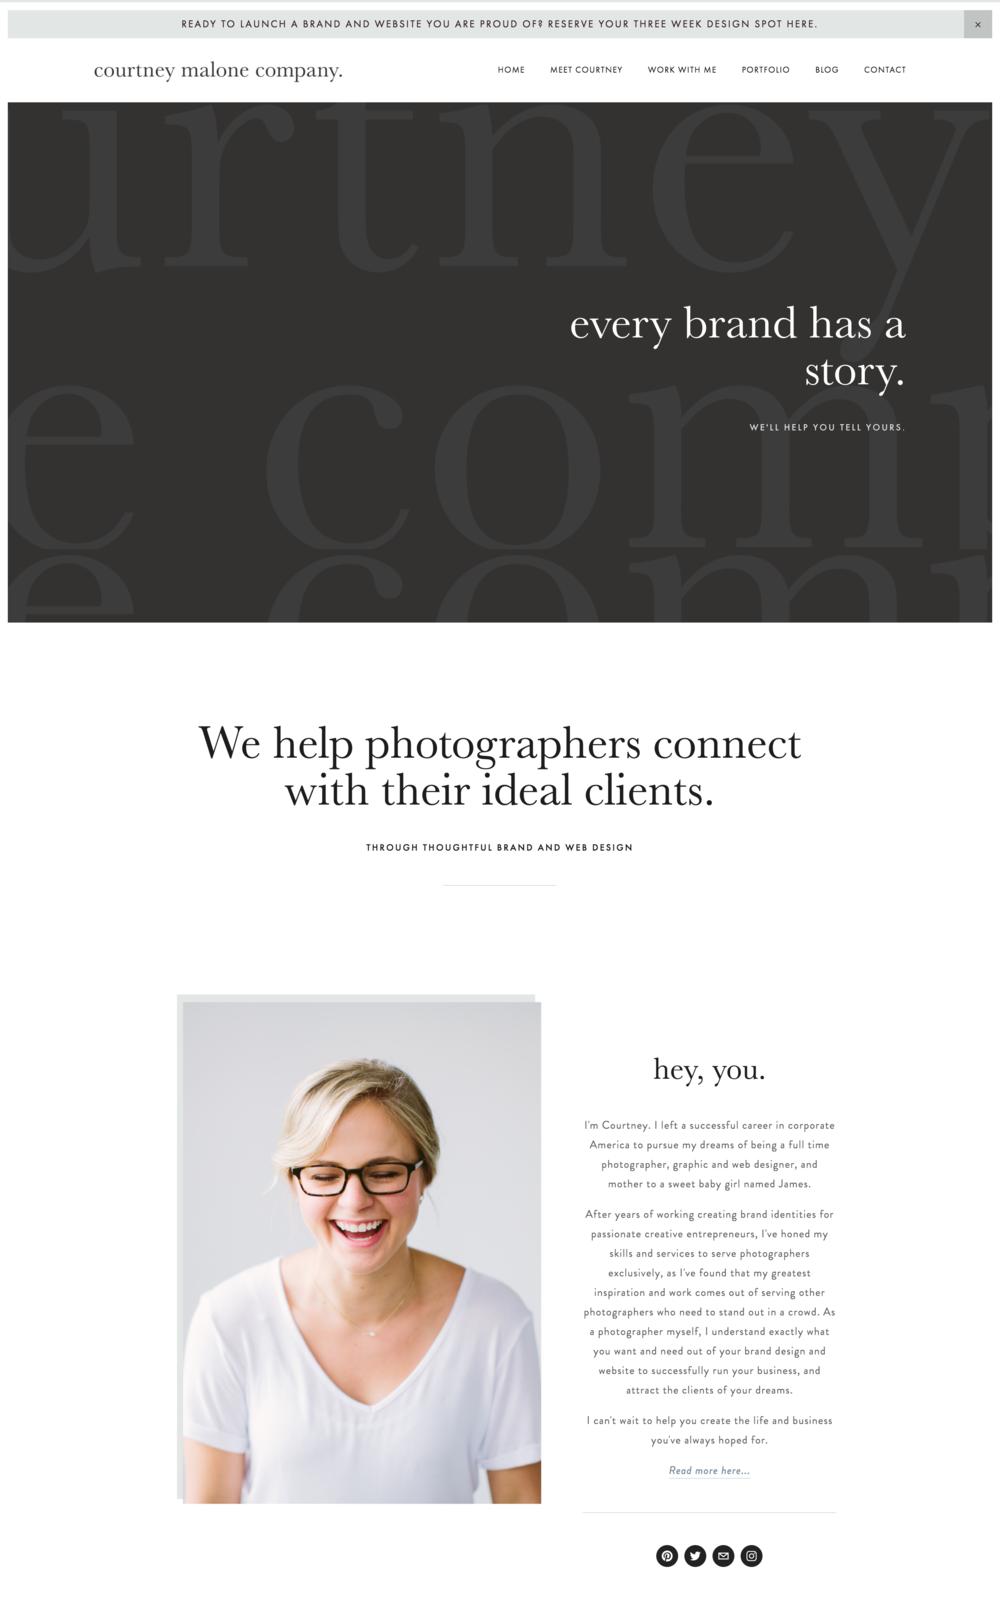 Courtney Malone Creative Services Website